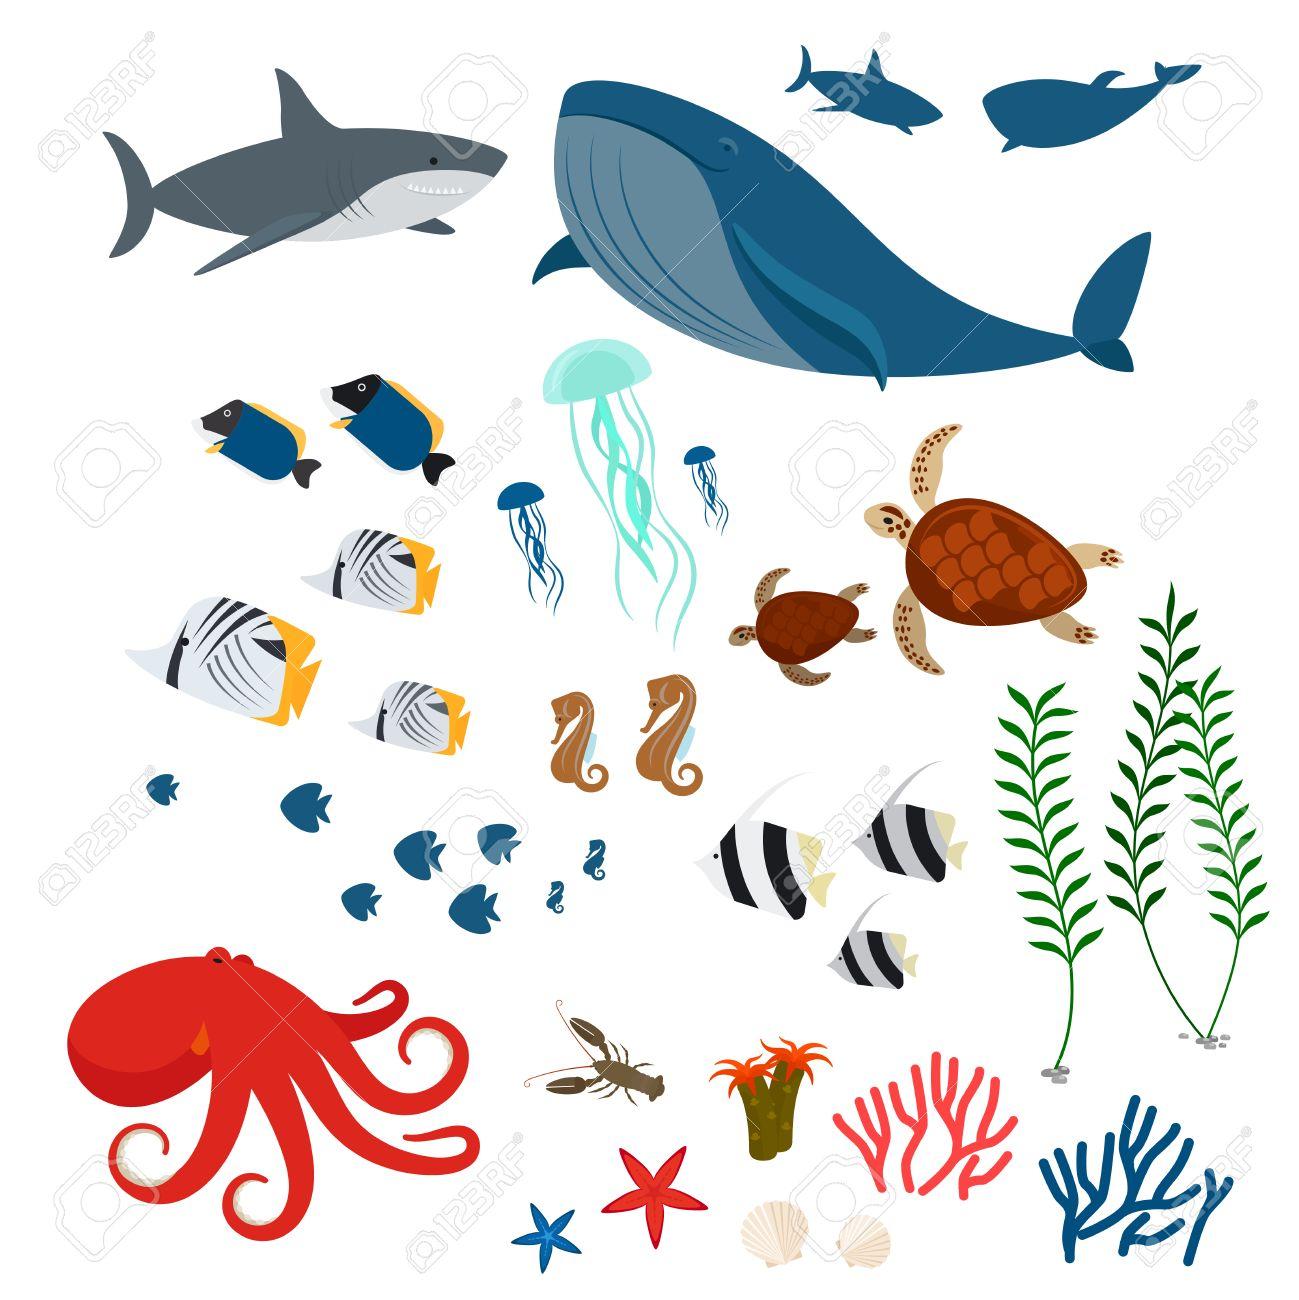 ocean animals sea fauna and sea fishes ocean fauna icons on